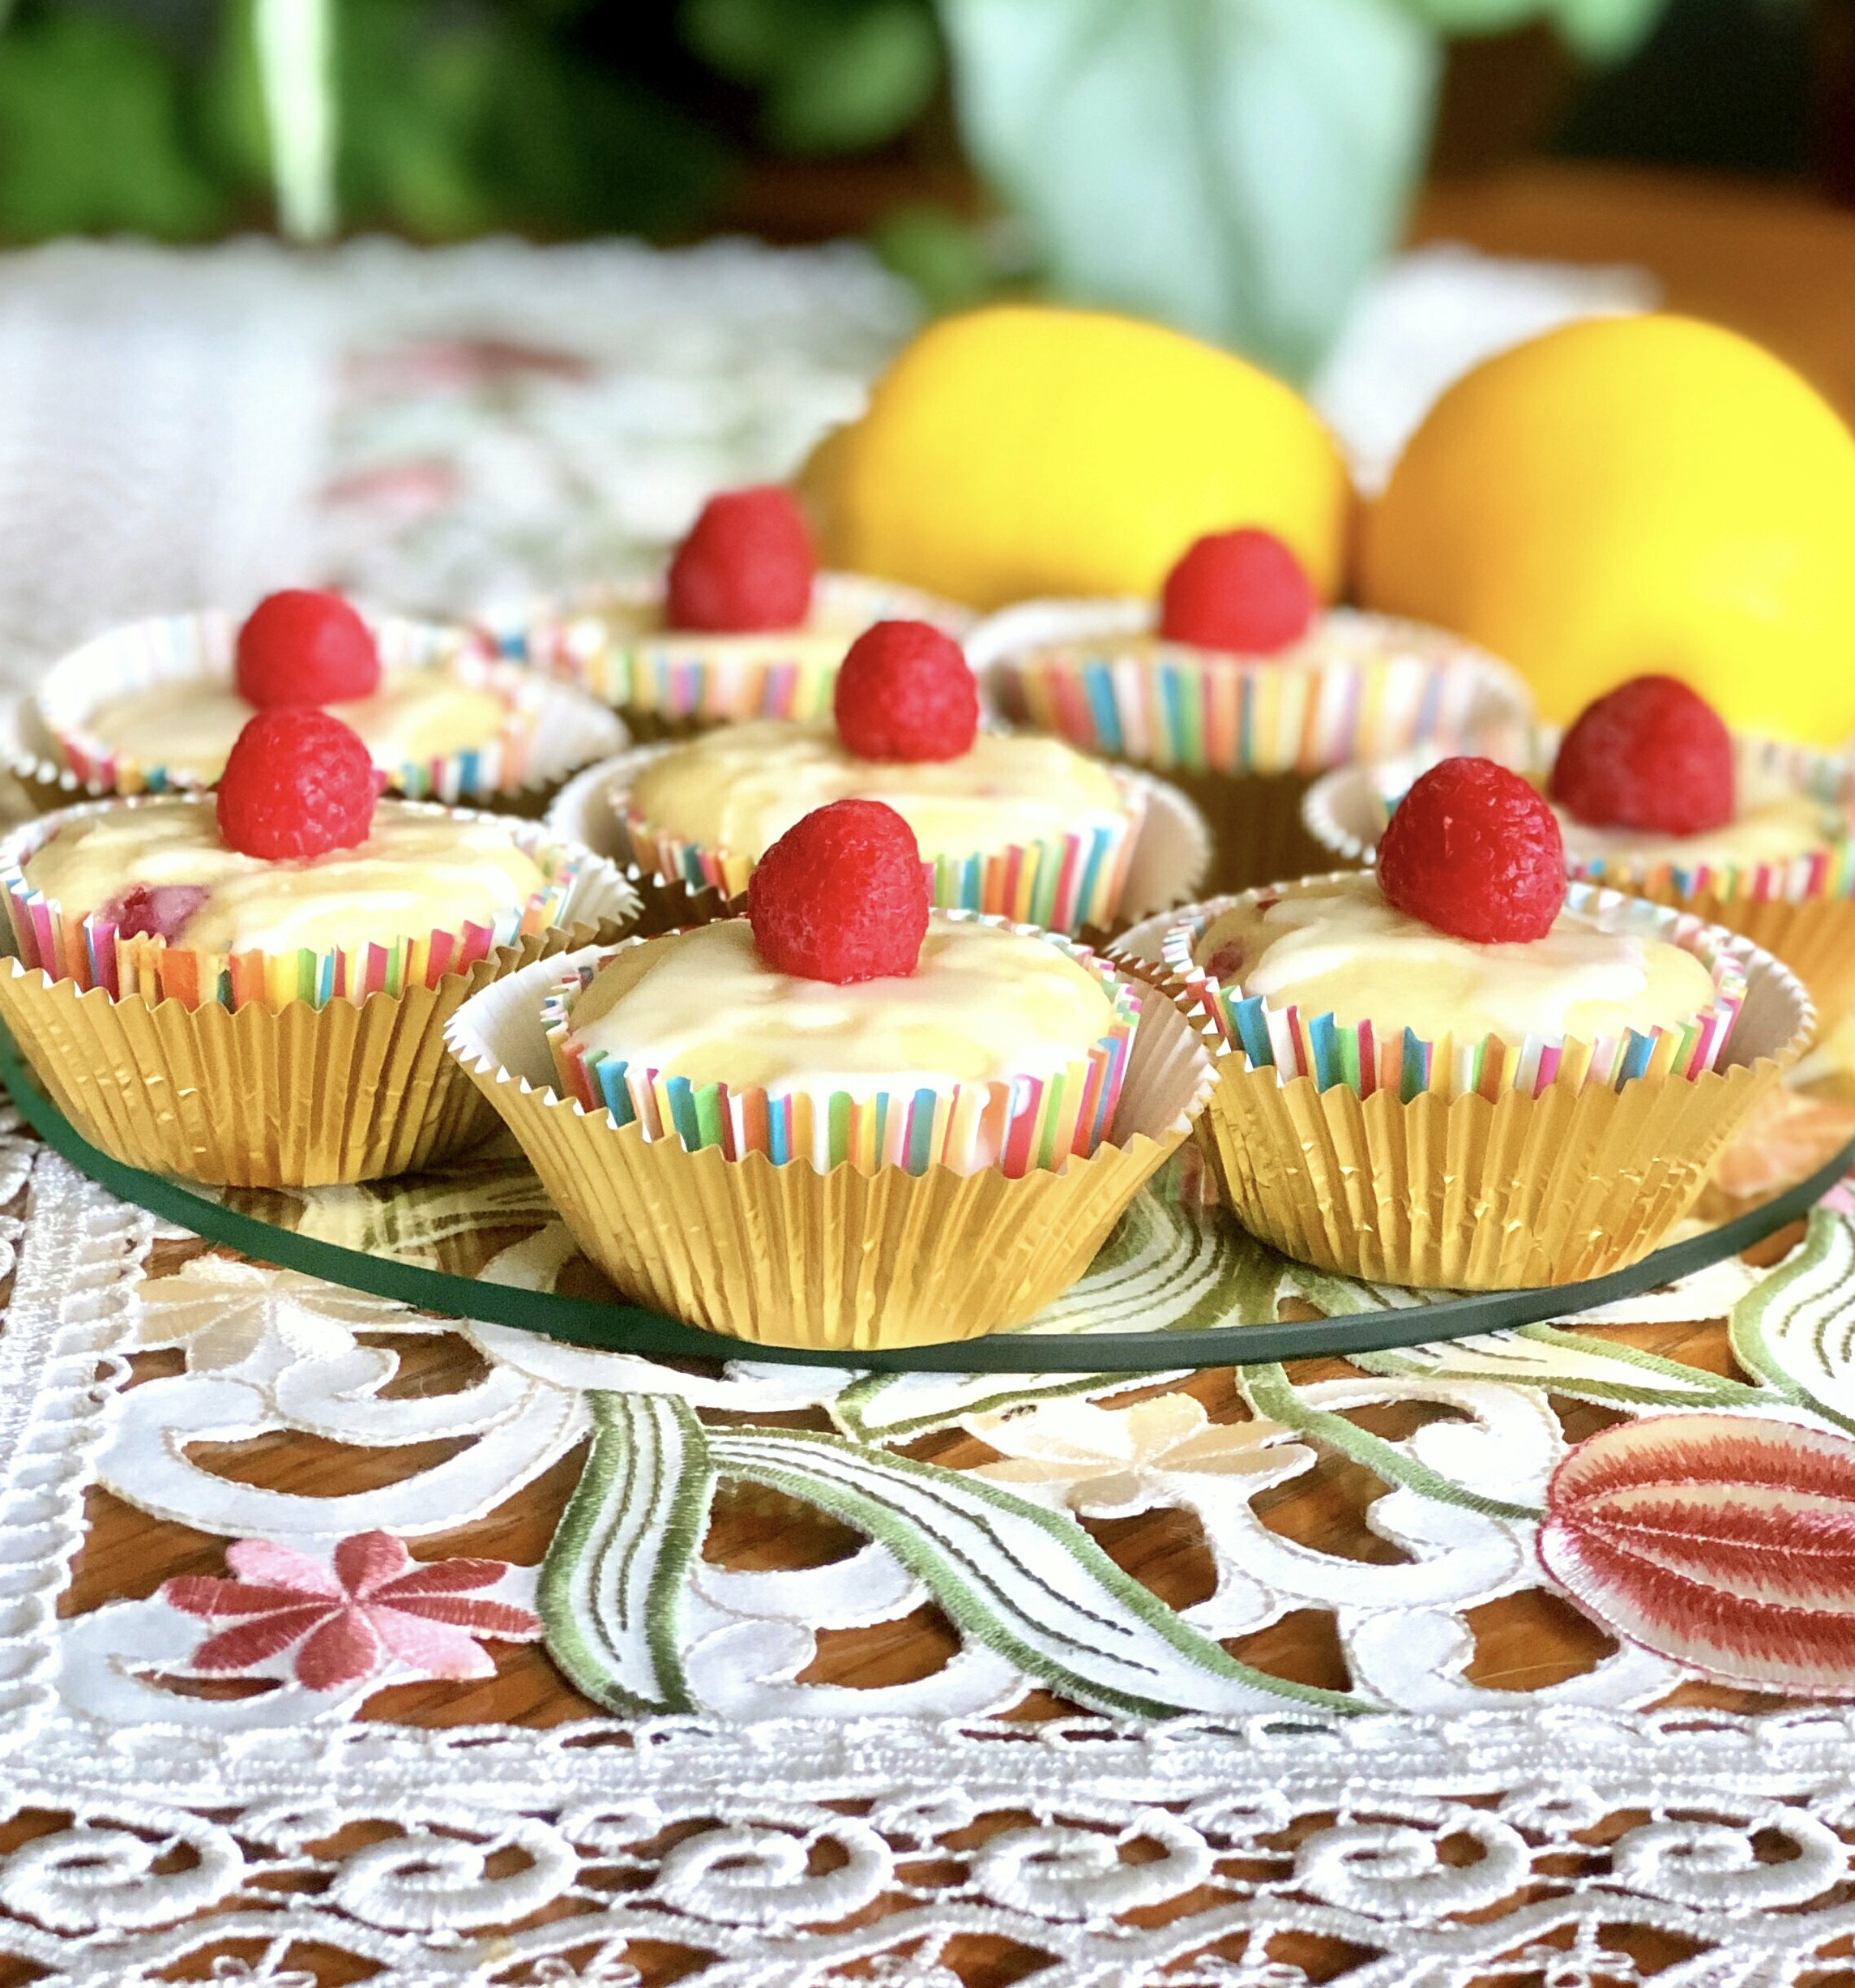 Raspberry-Lemon Cupcakes